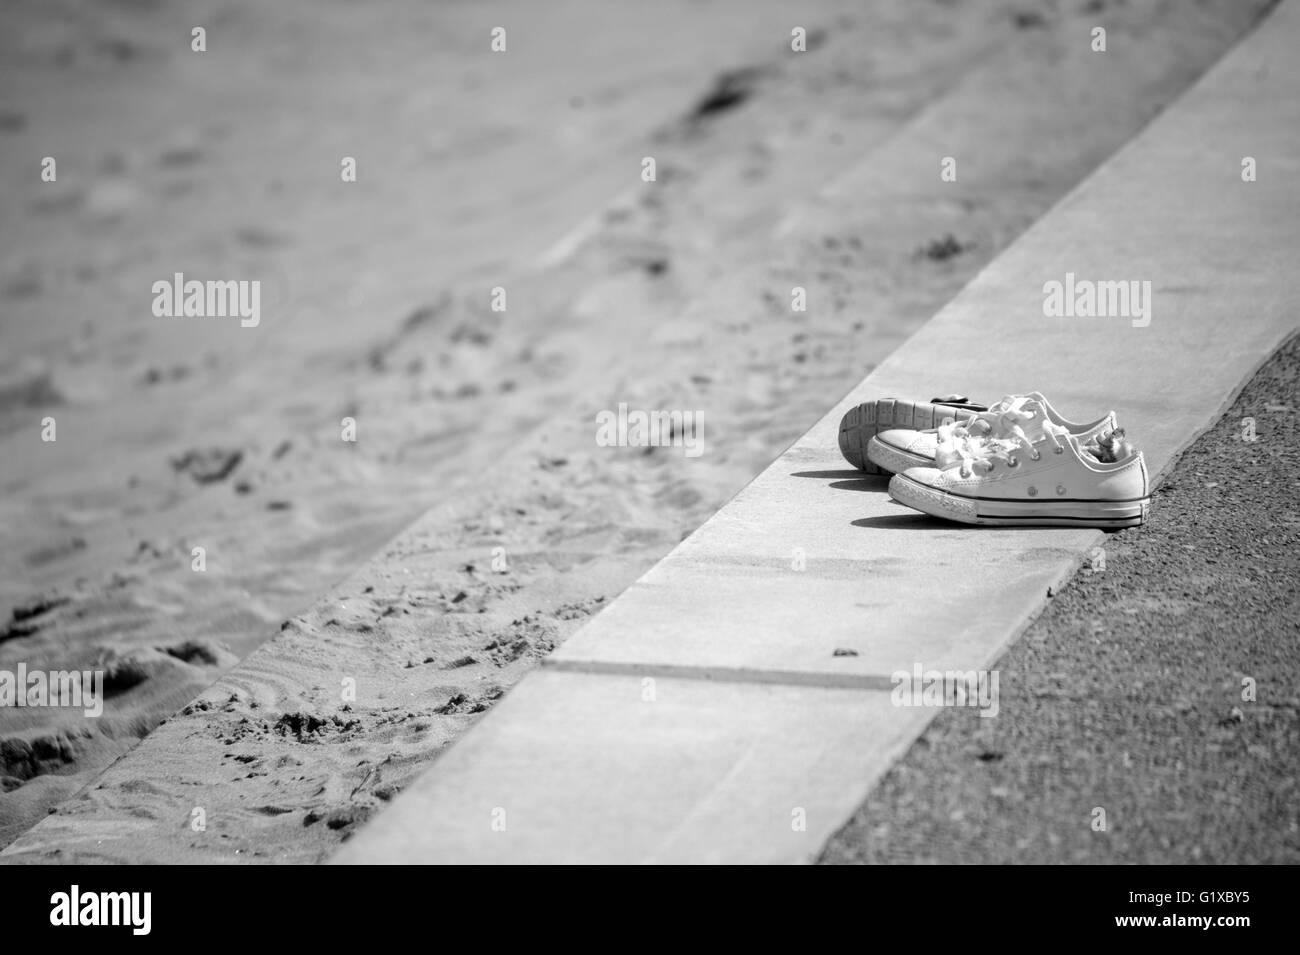 Discarded sandshoes - Stock Image